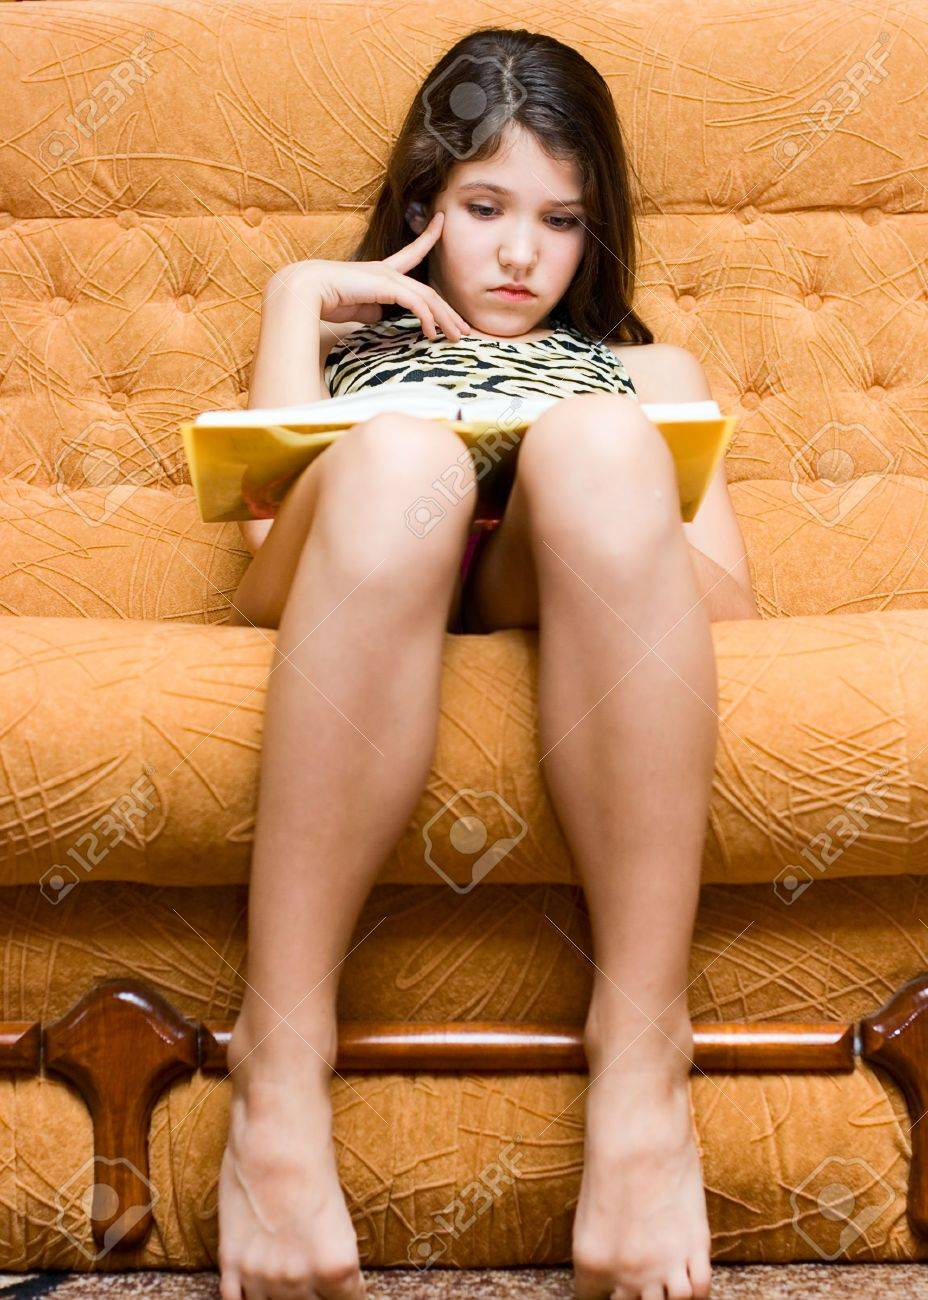 Teen girl reading book on sofa Stock Photo - 6453690